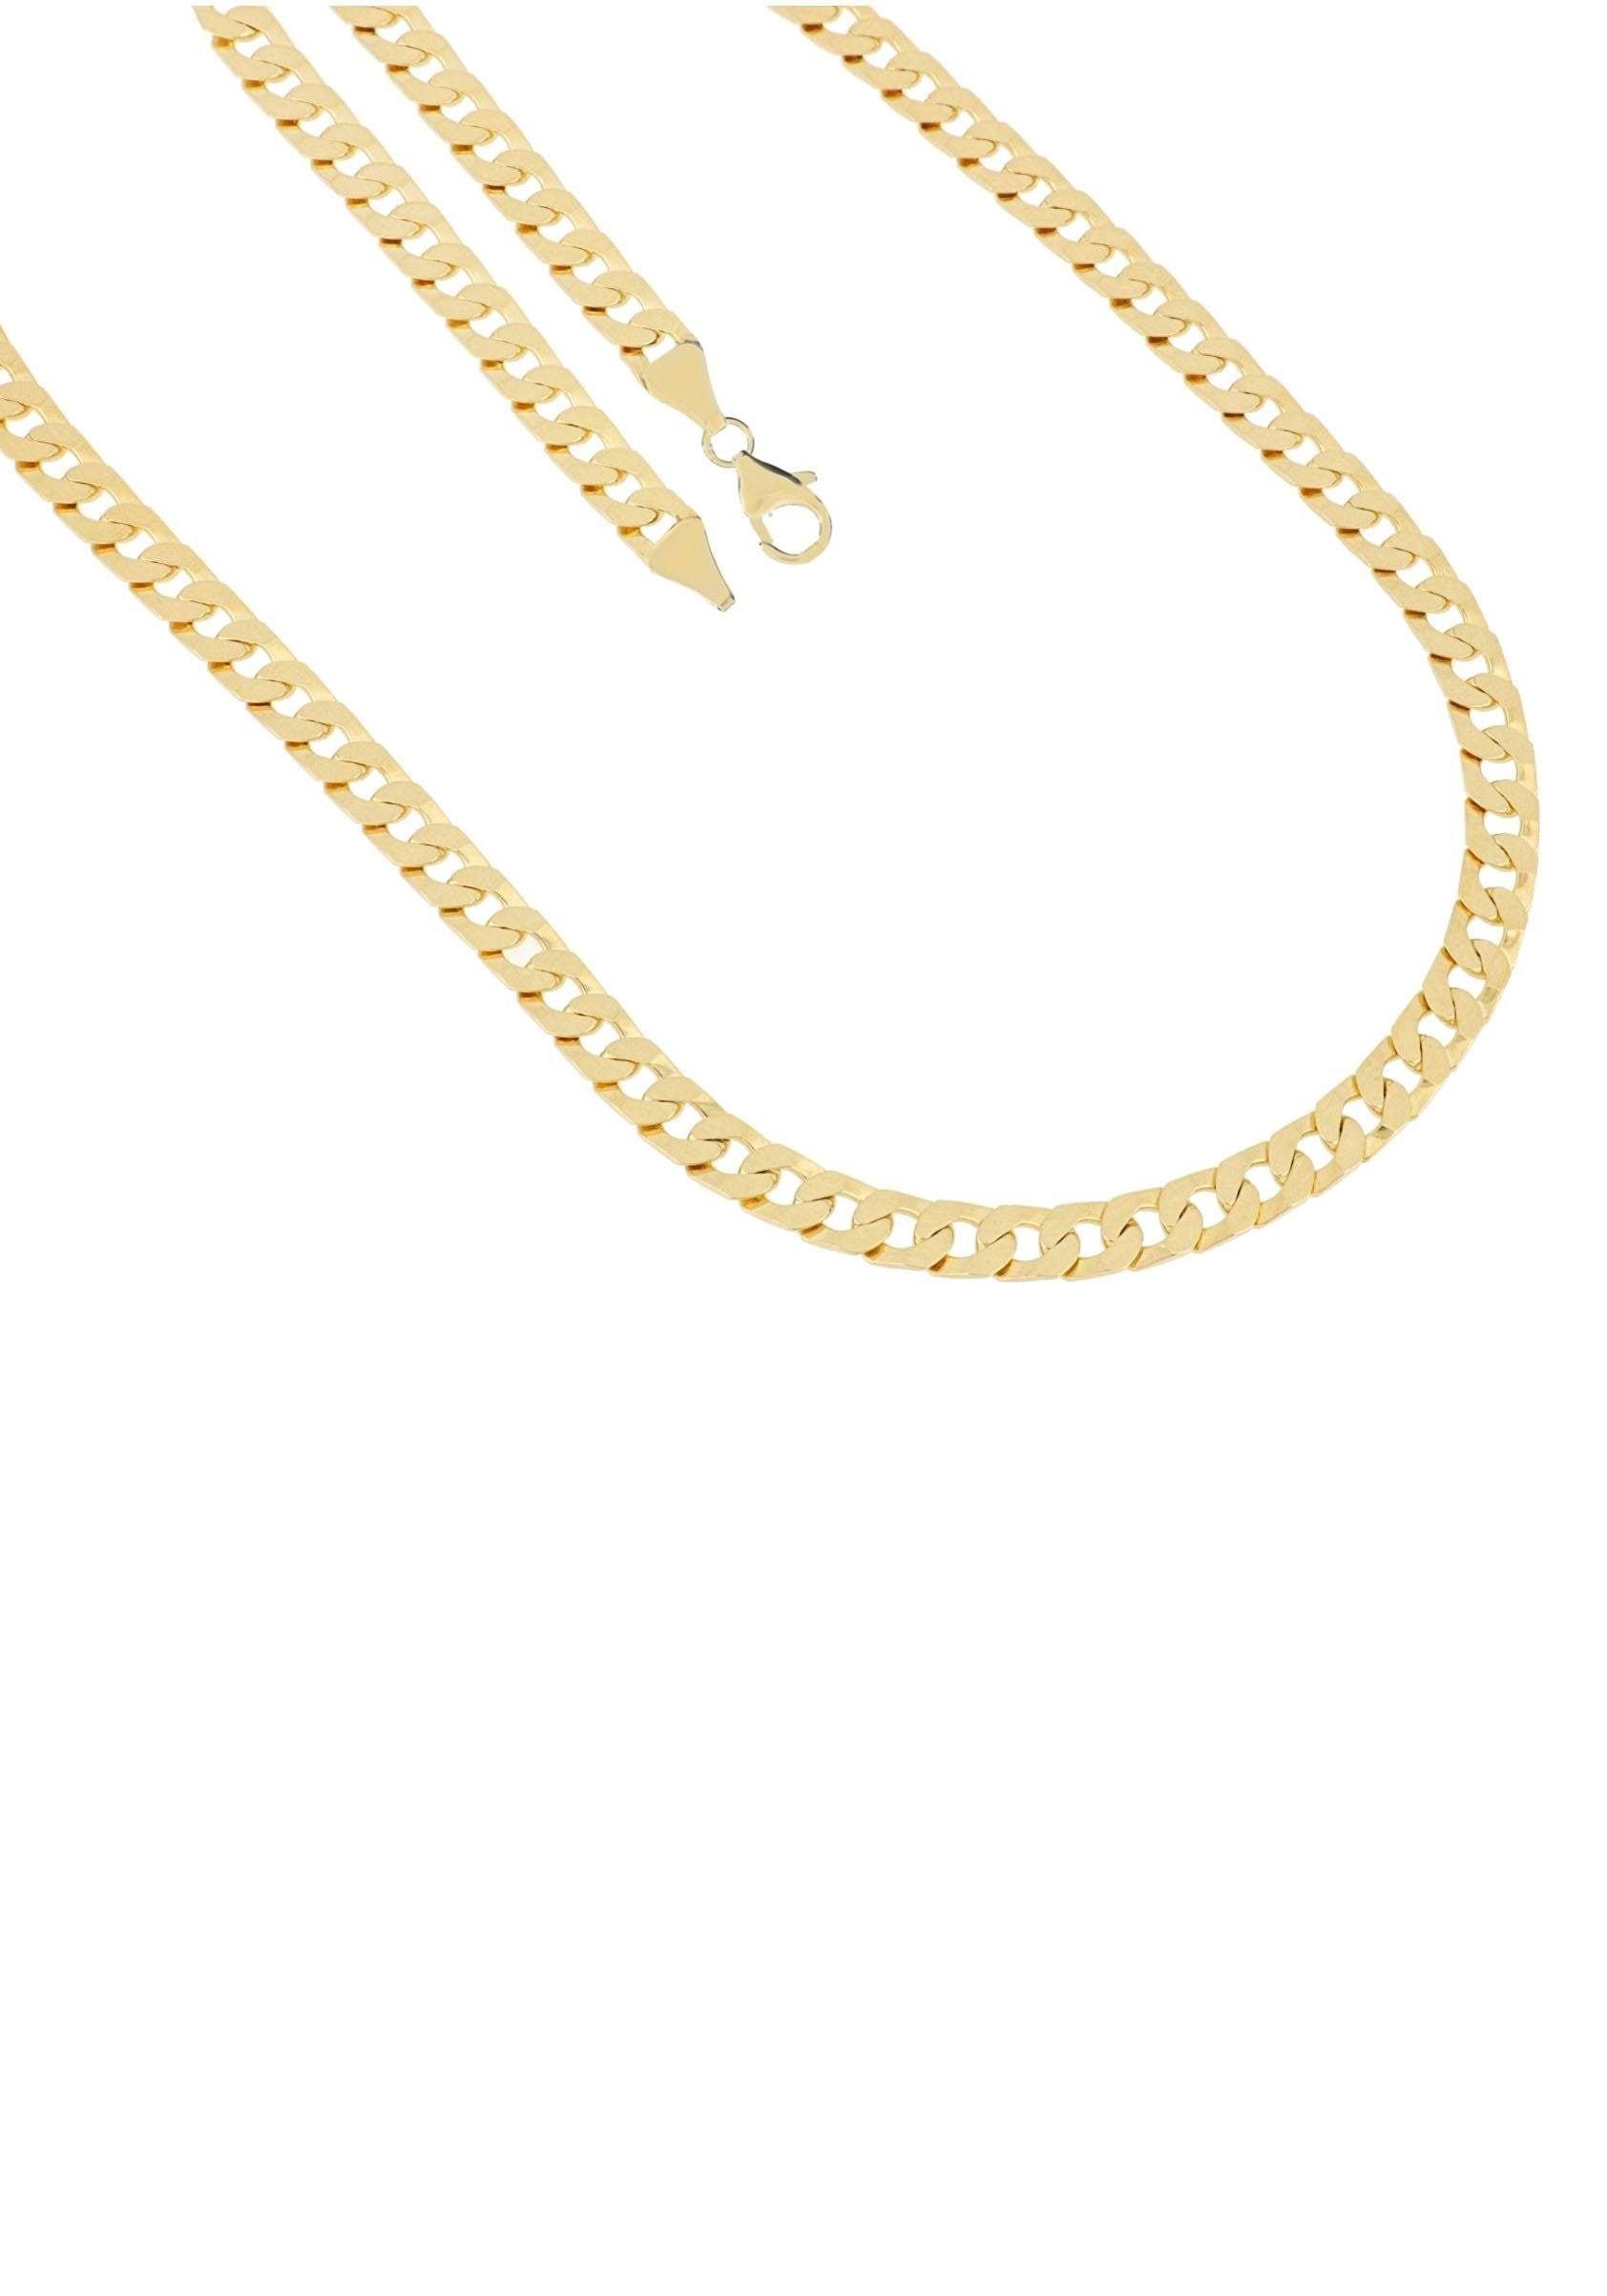 Firetti Kette ohne Anhänger in Panzerkettengliederung 70 mm glänzende Optik vergoldet 6-fach diamantiert | Schmuck > Halsketten | Firetti